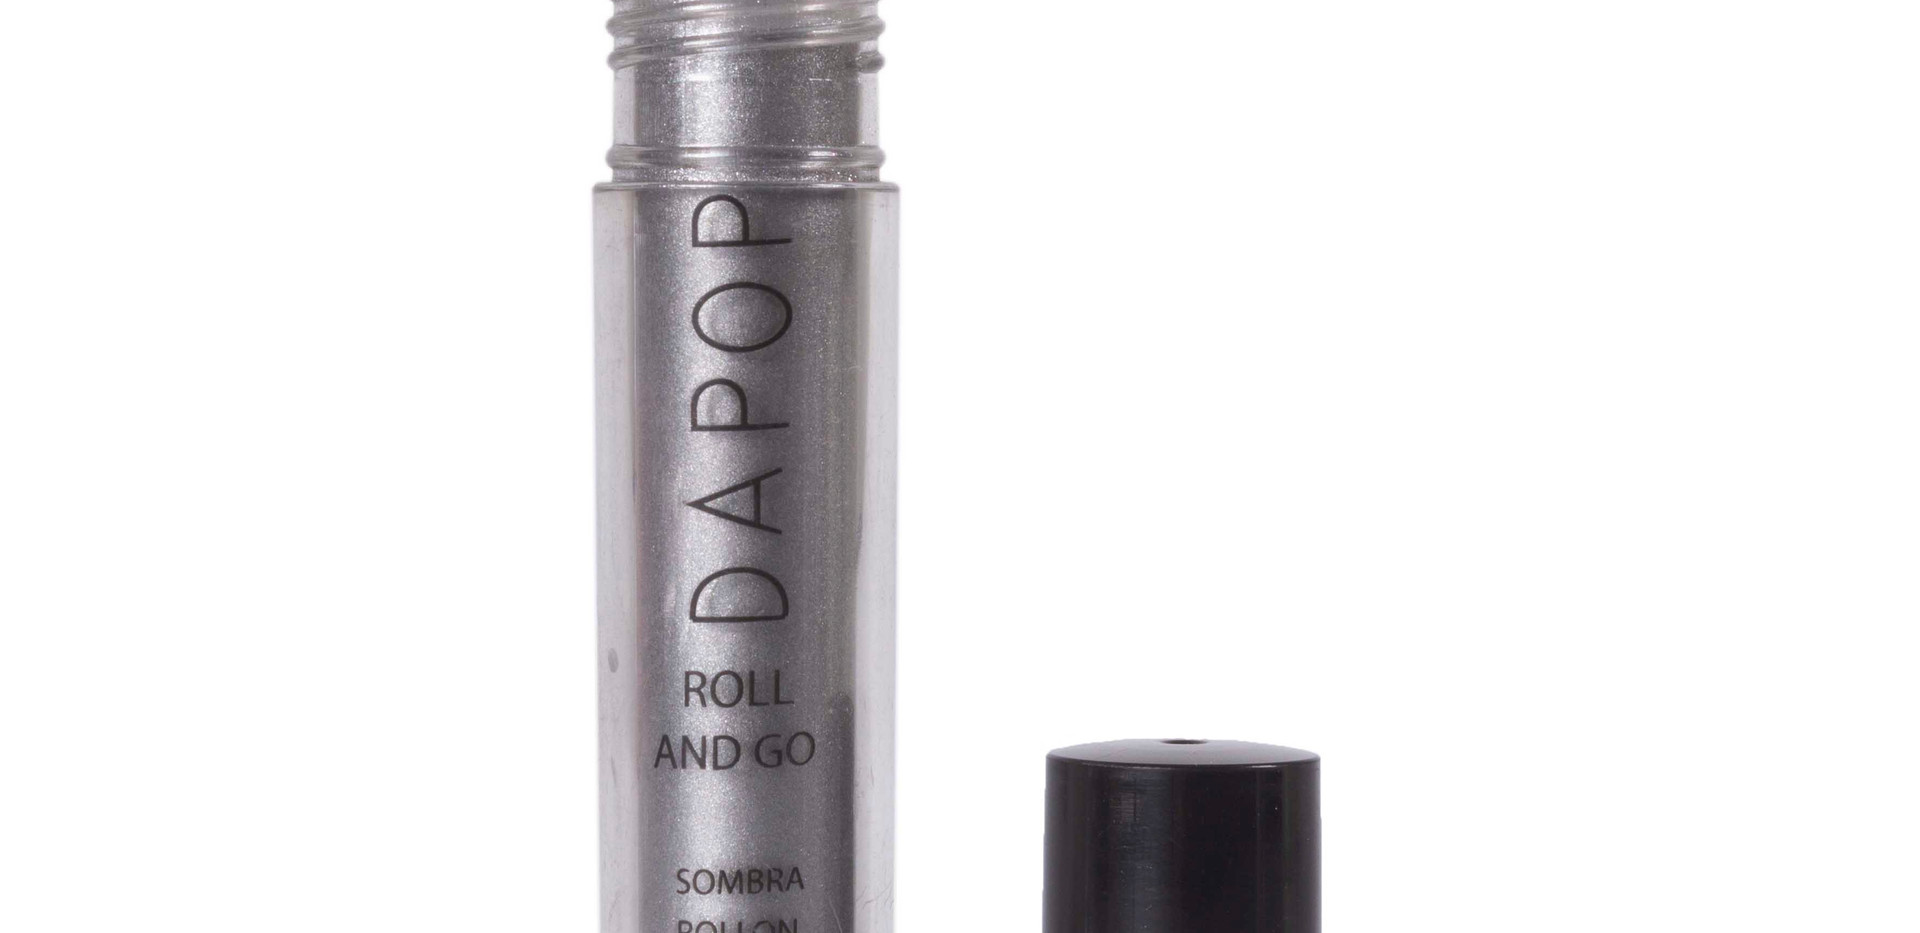 Sombra Iluminadora Roll-on Dapop - HB96605 (cor 5)